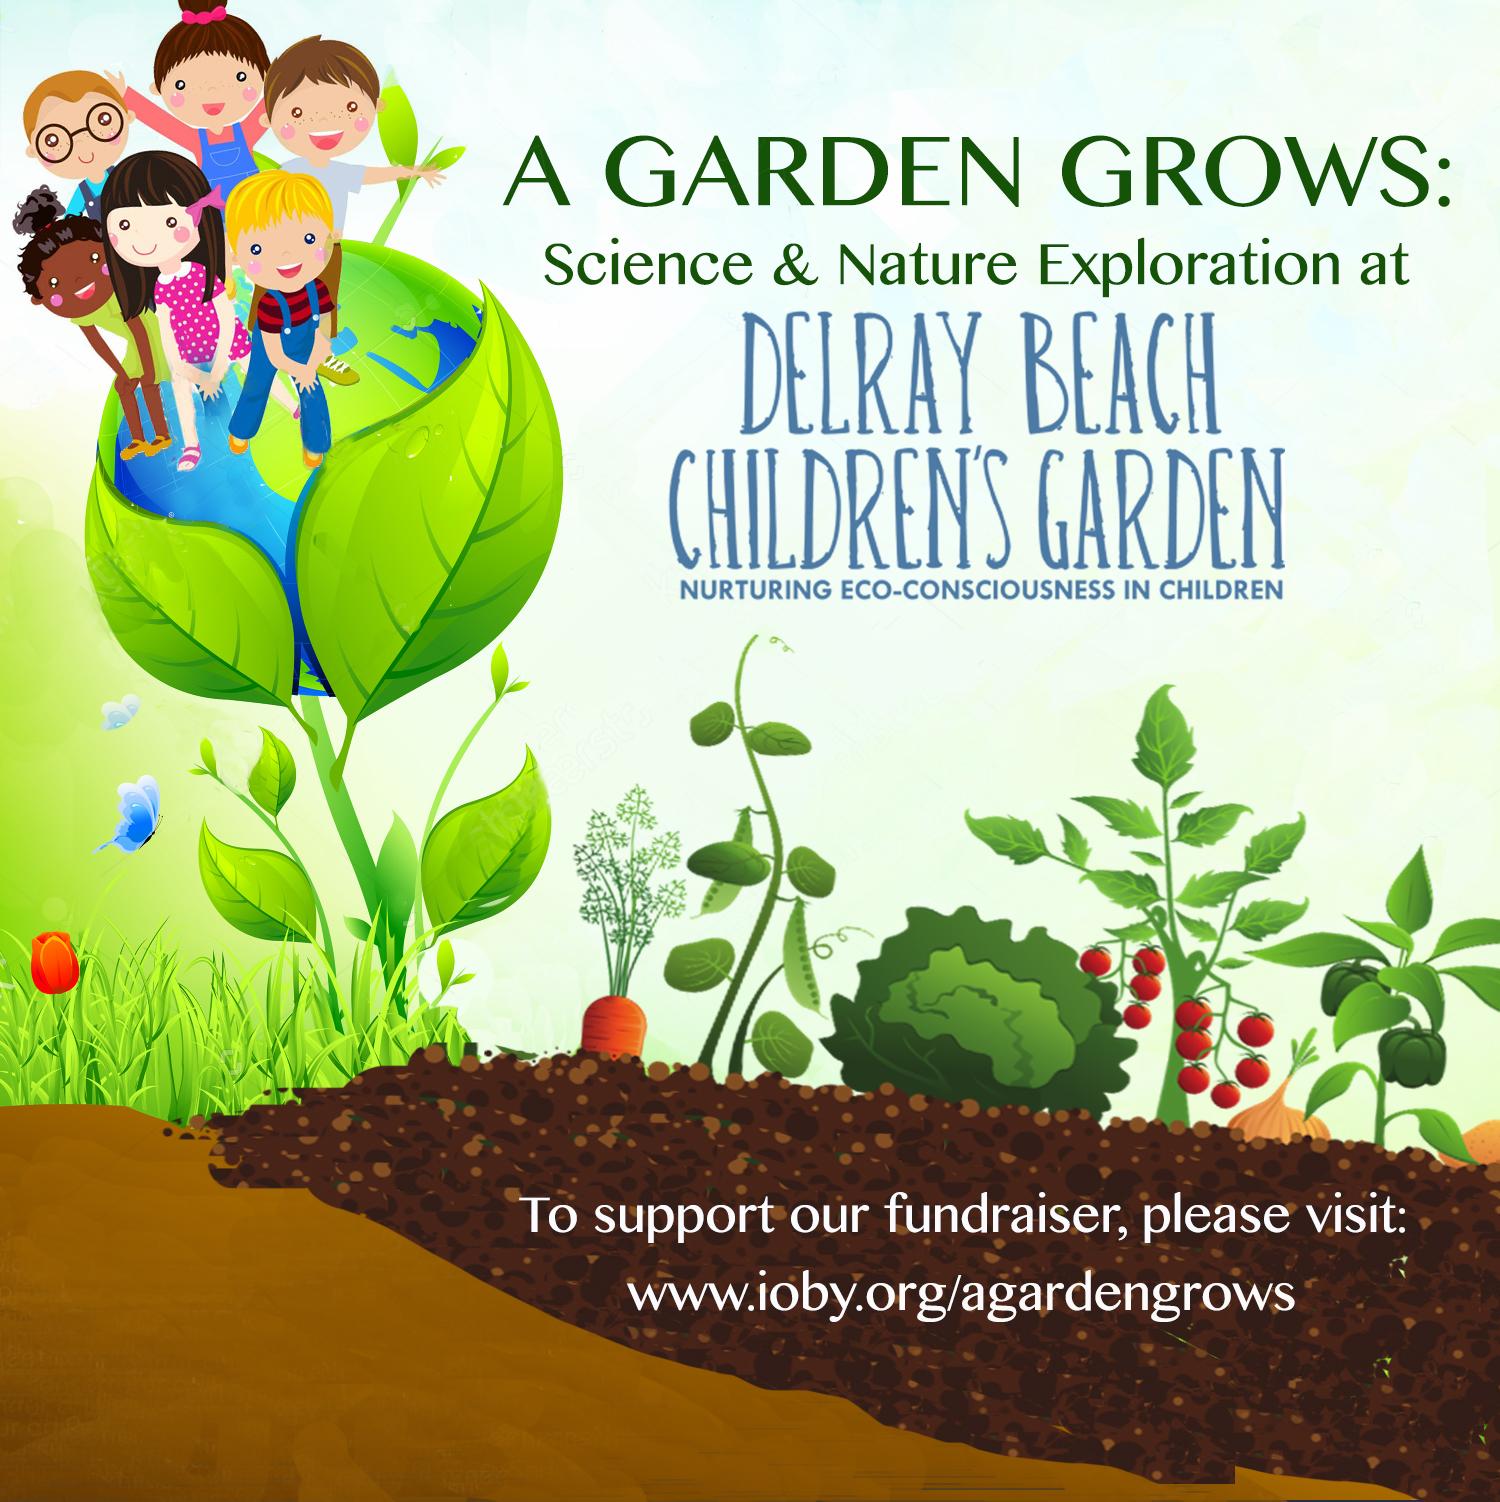 Science & Nature Exploration - Goal: Raise $11,000 for Class Supplies,Garden Maintenance Tools, Facility Enhancement